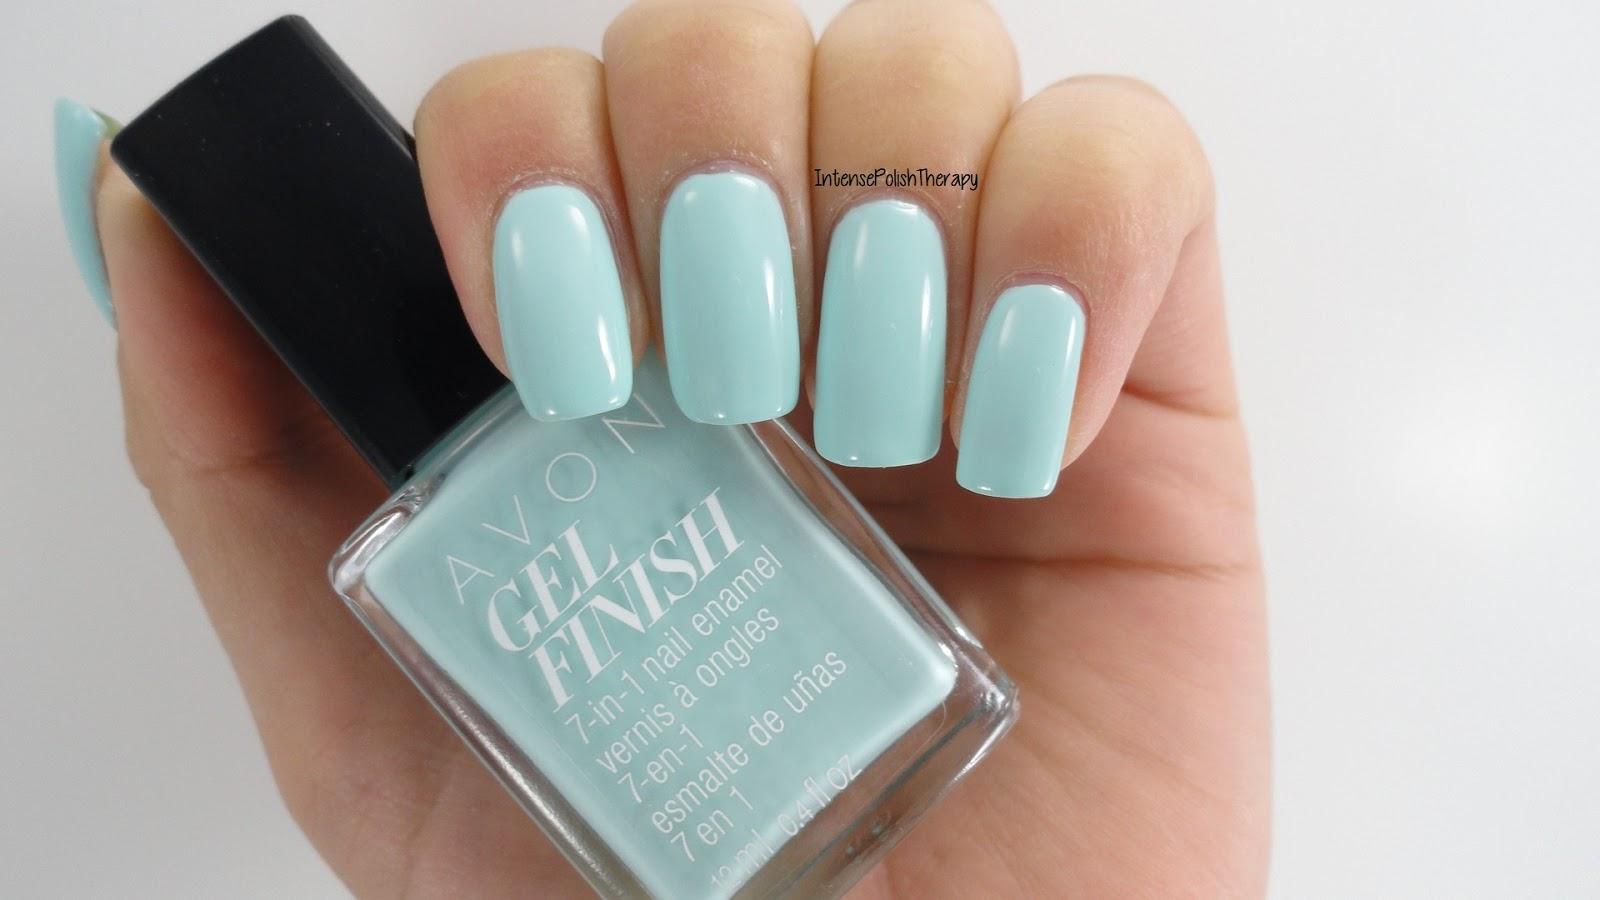 Intense Polish Therapy Avon Gel Finish Nail Enamel